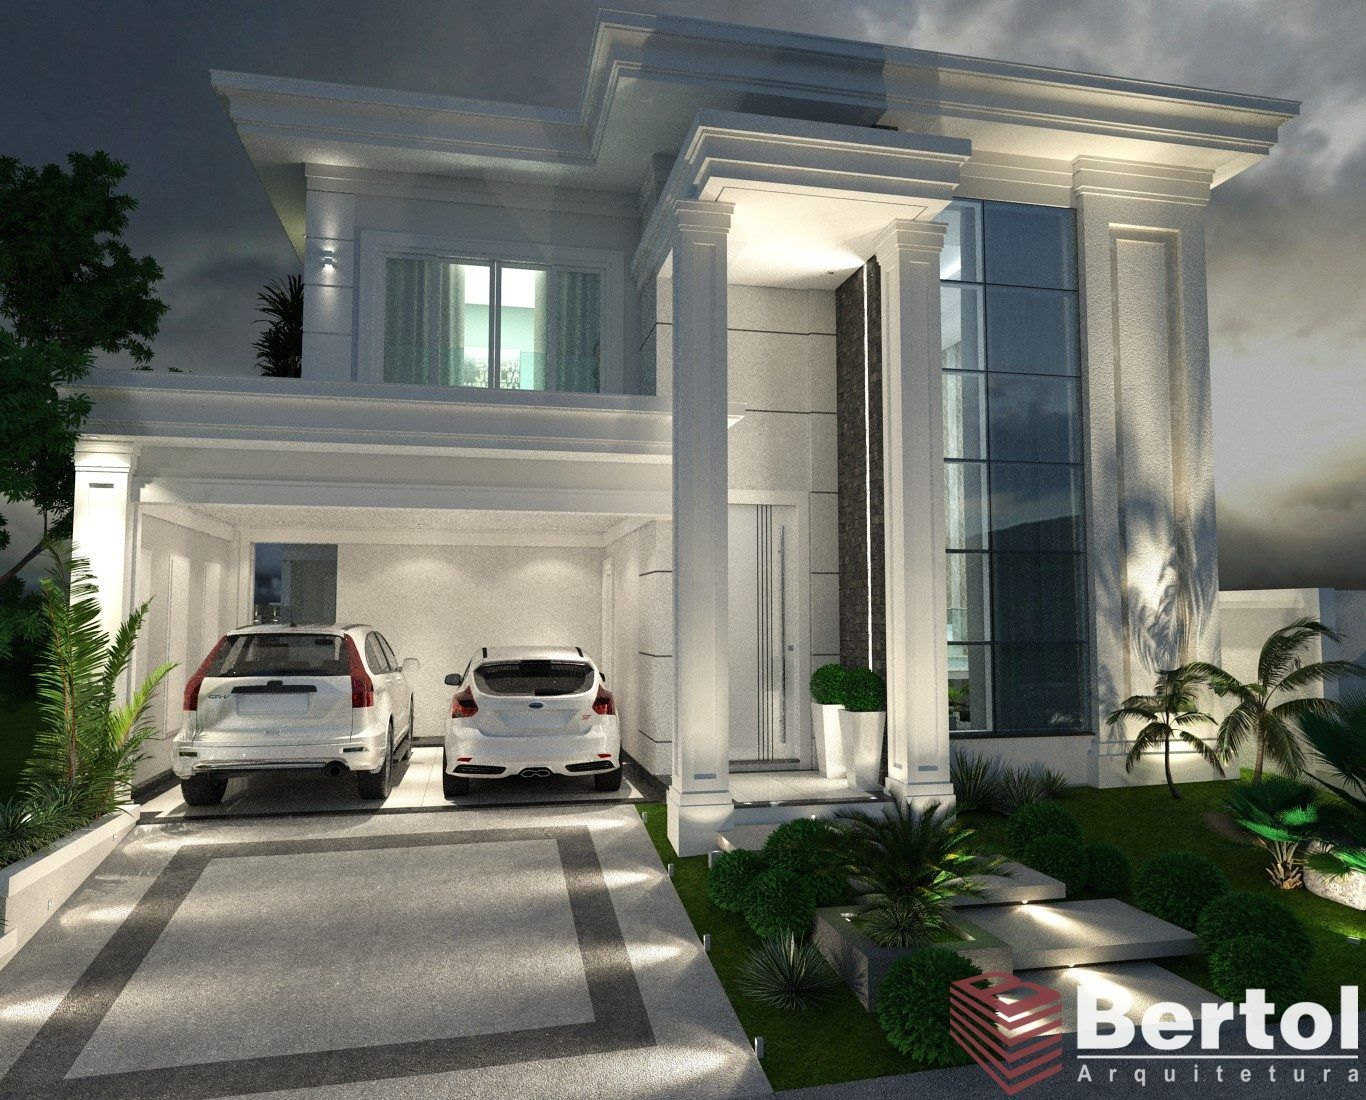 Bertol arquitetura projetos sobradosml also best sl house images in rh pinterest